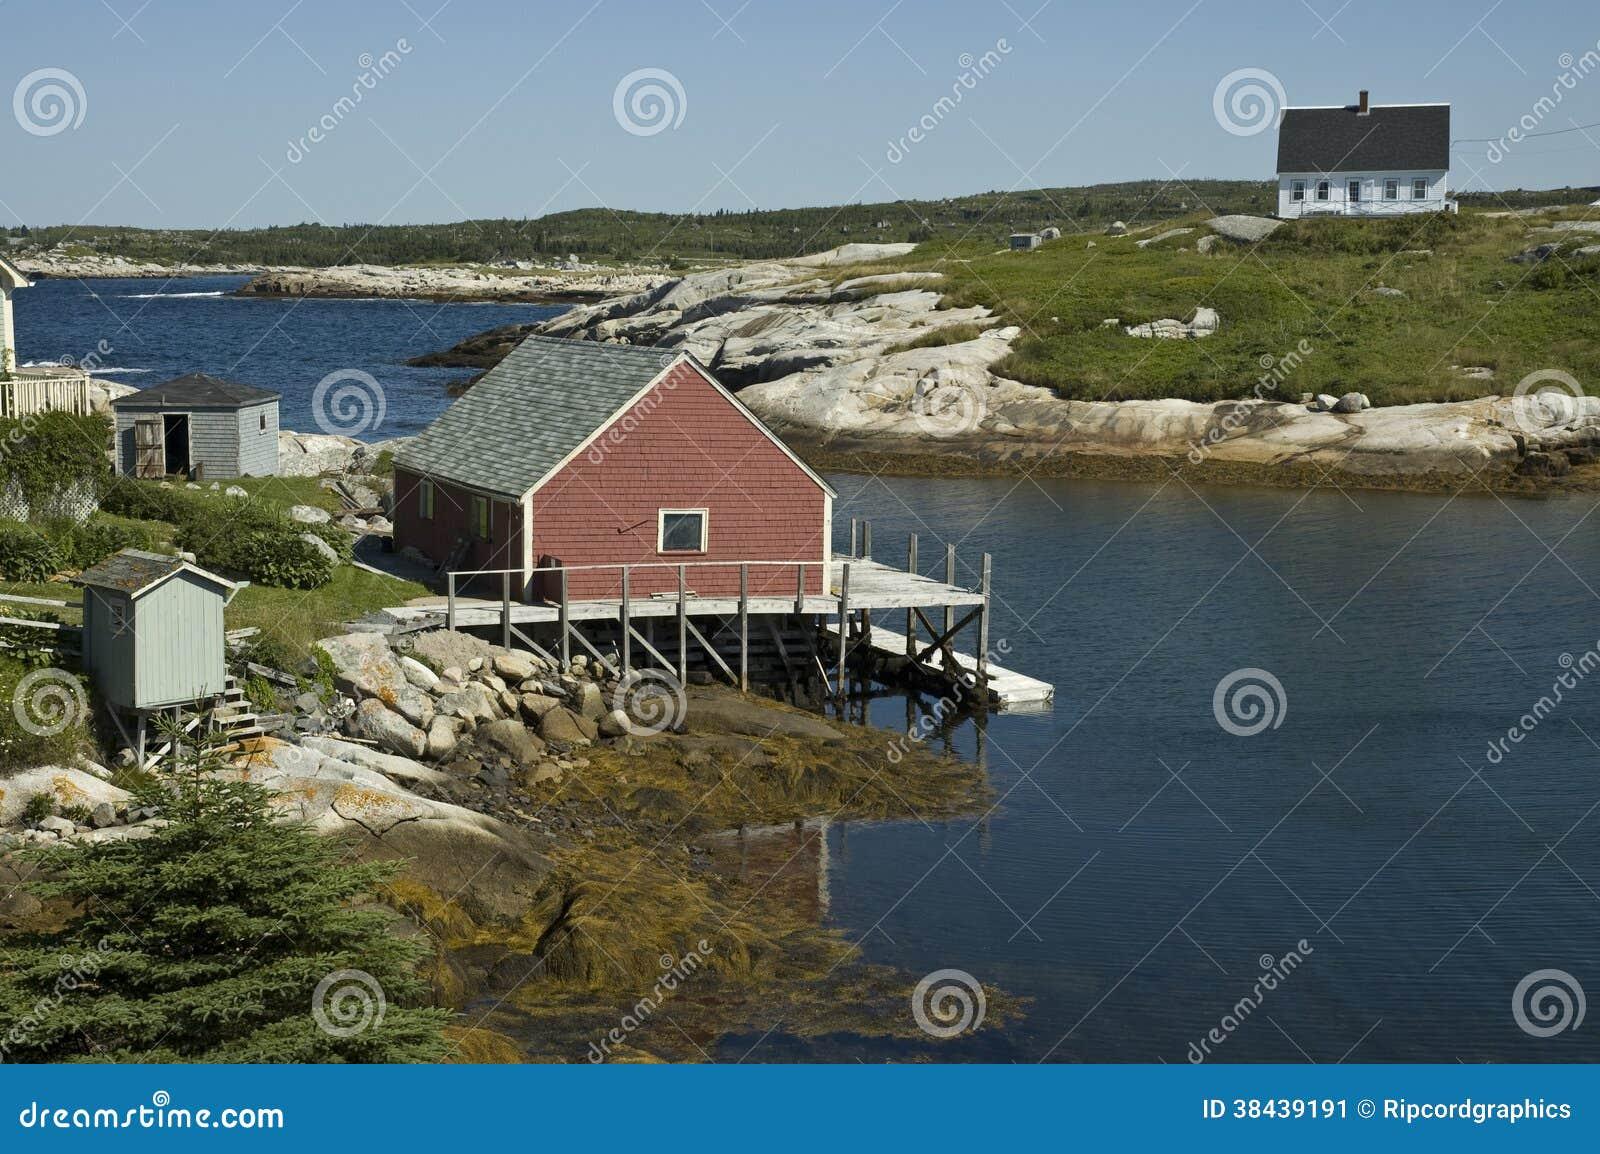 Peggy's Cove, Nova Scotia stock image  Image of halifax